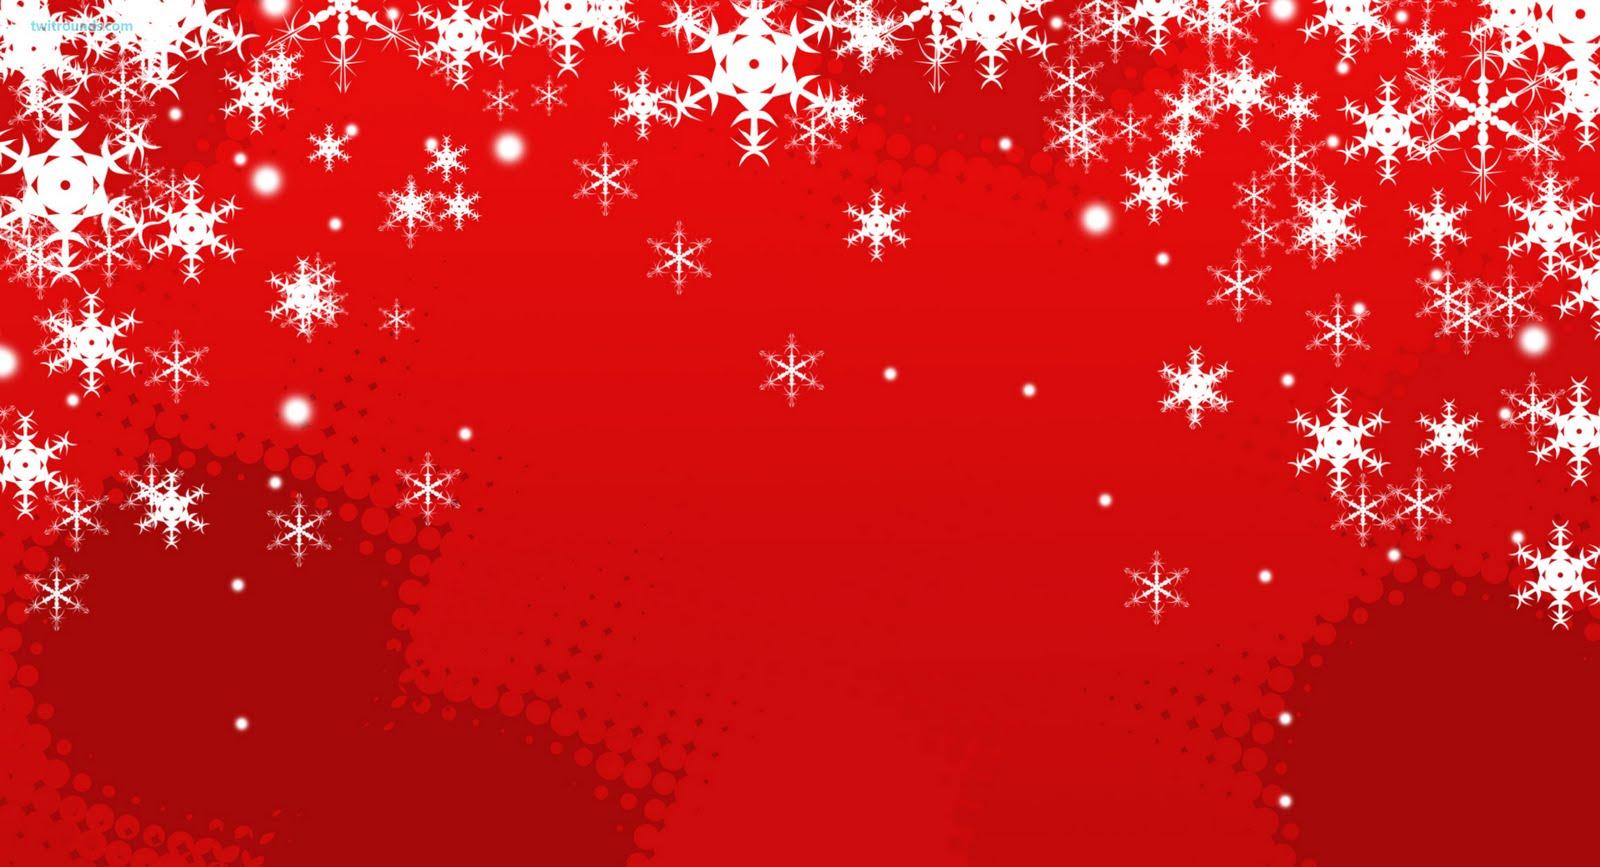 Red Christmas Backgrounds Wallpapersafari